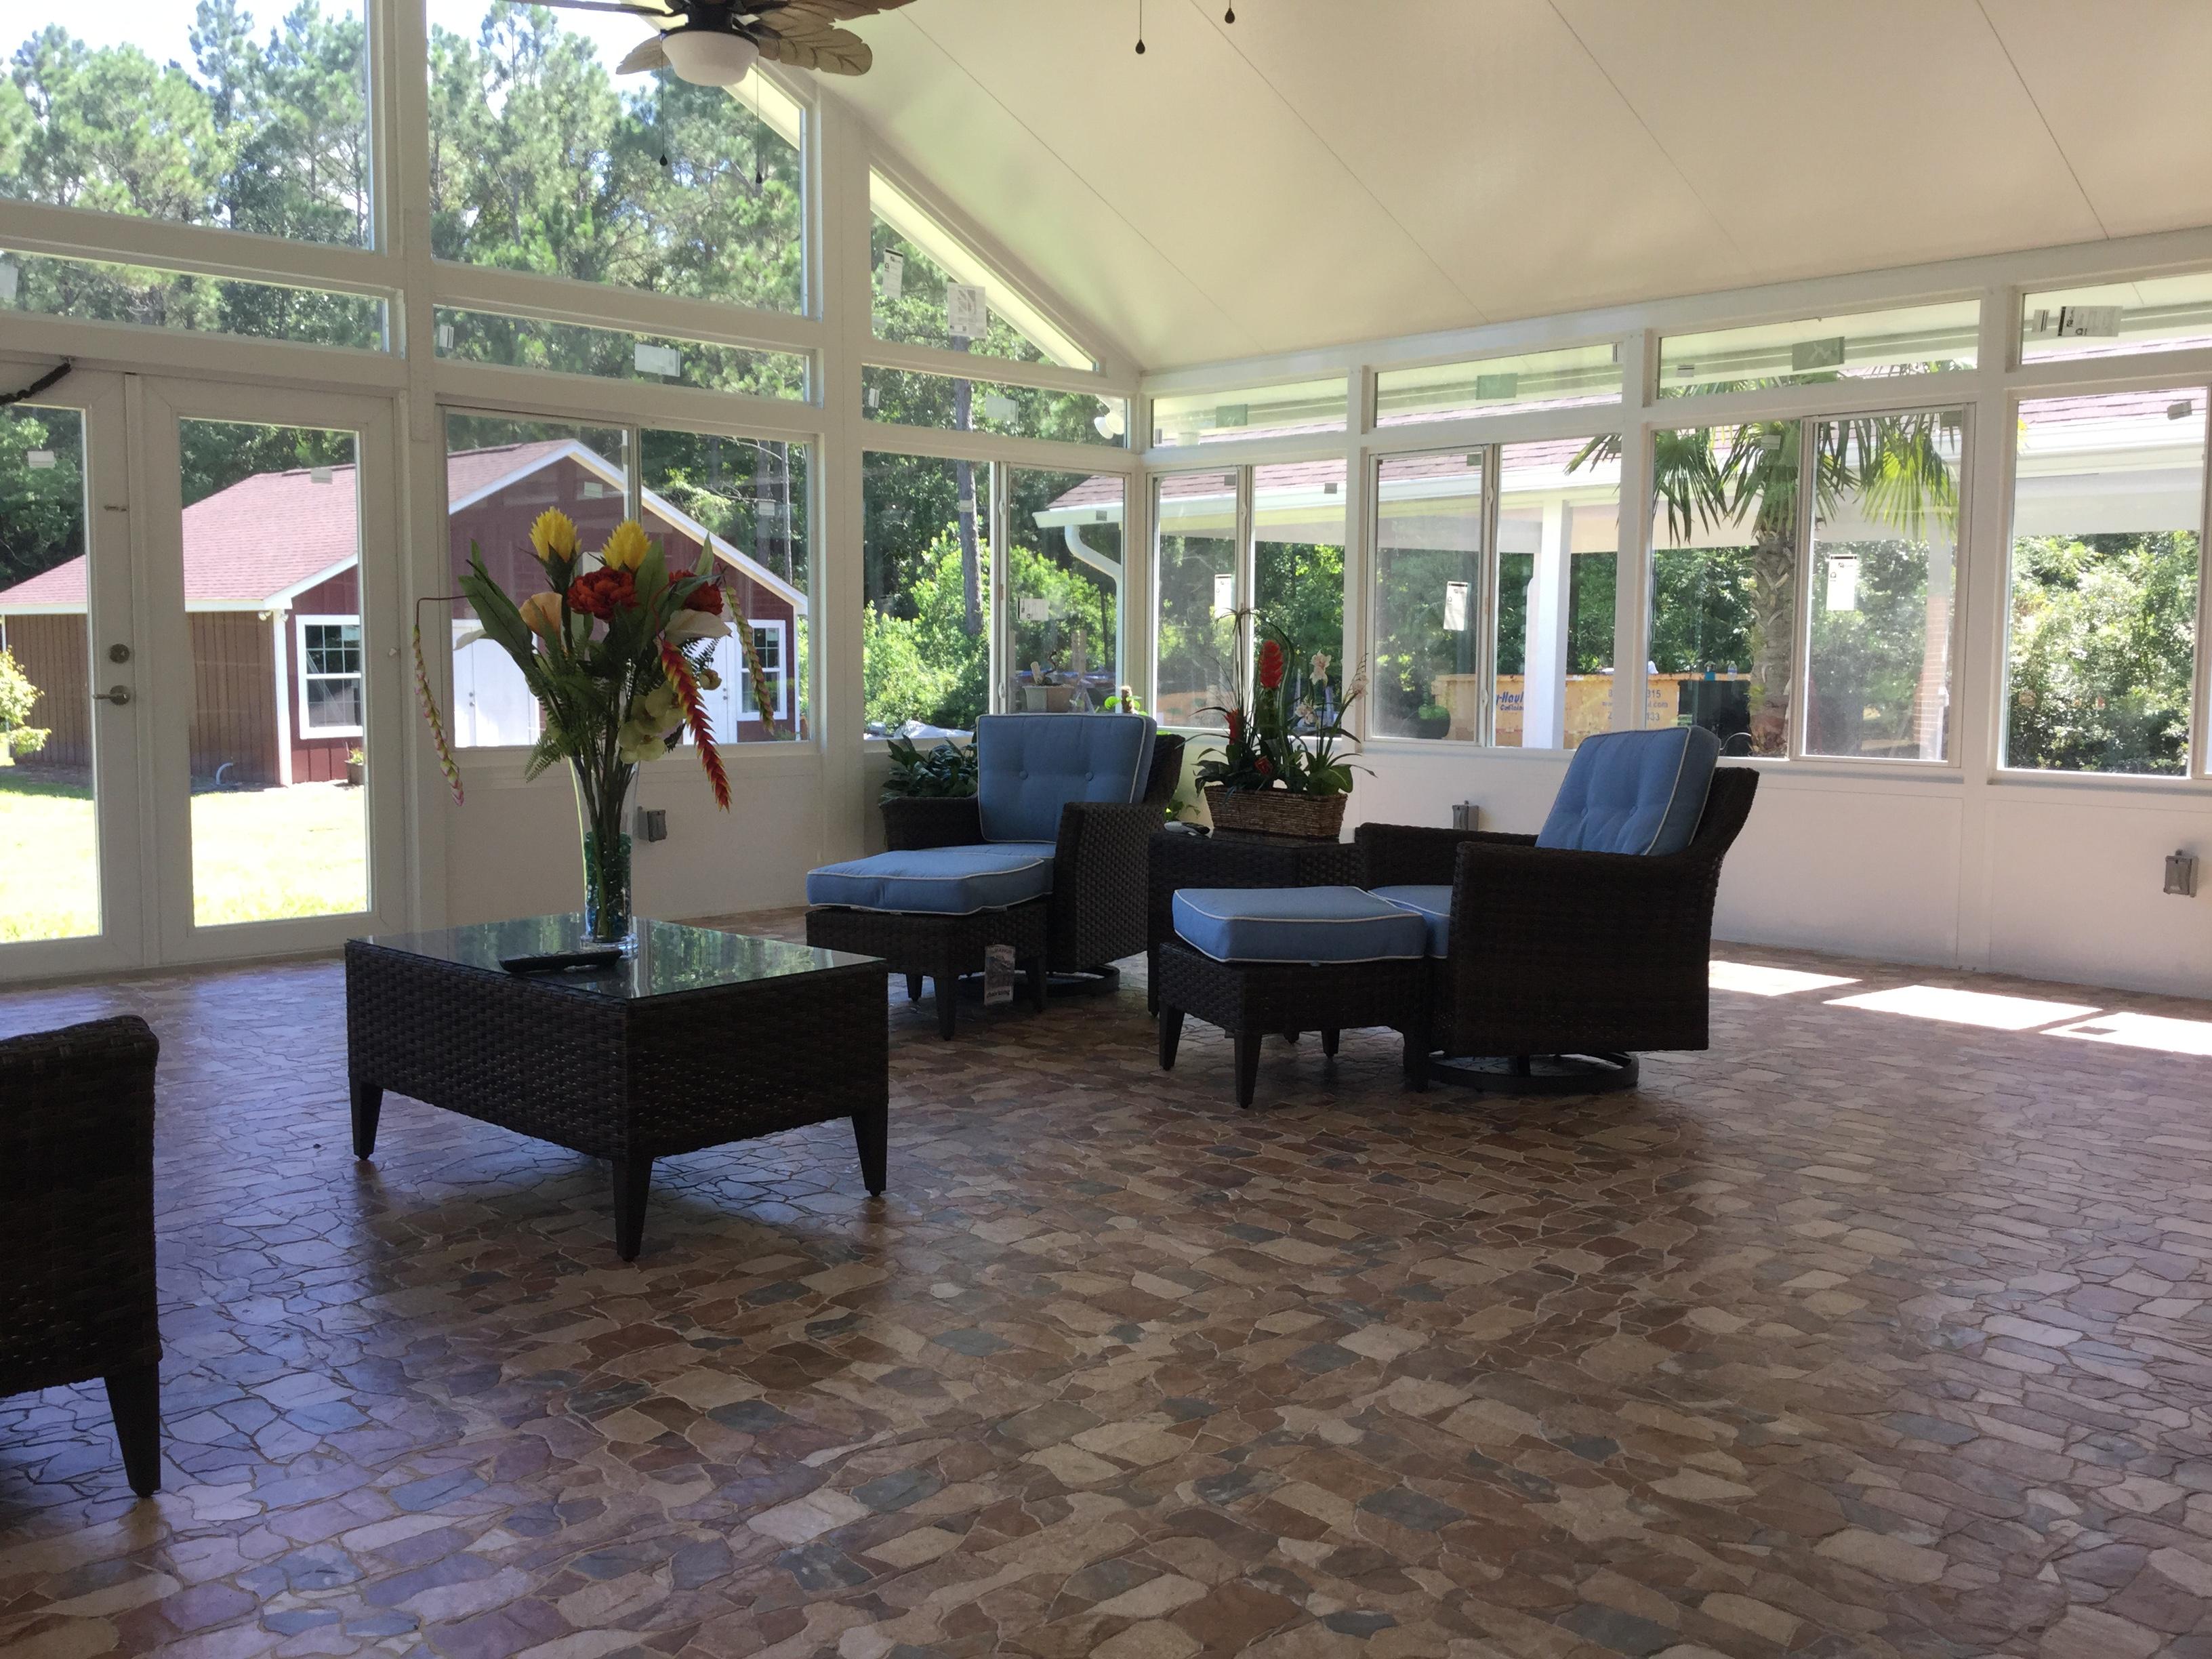 Cathedral Sunroom 1st Choice Home Improvements Fairhope Al